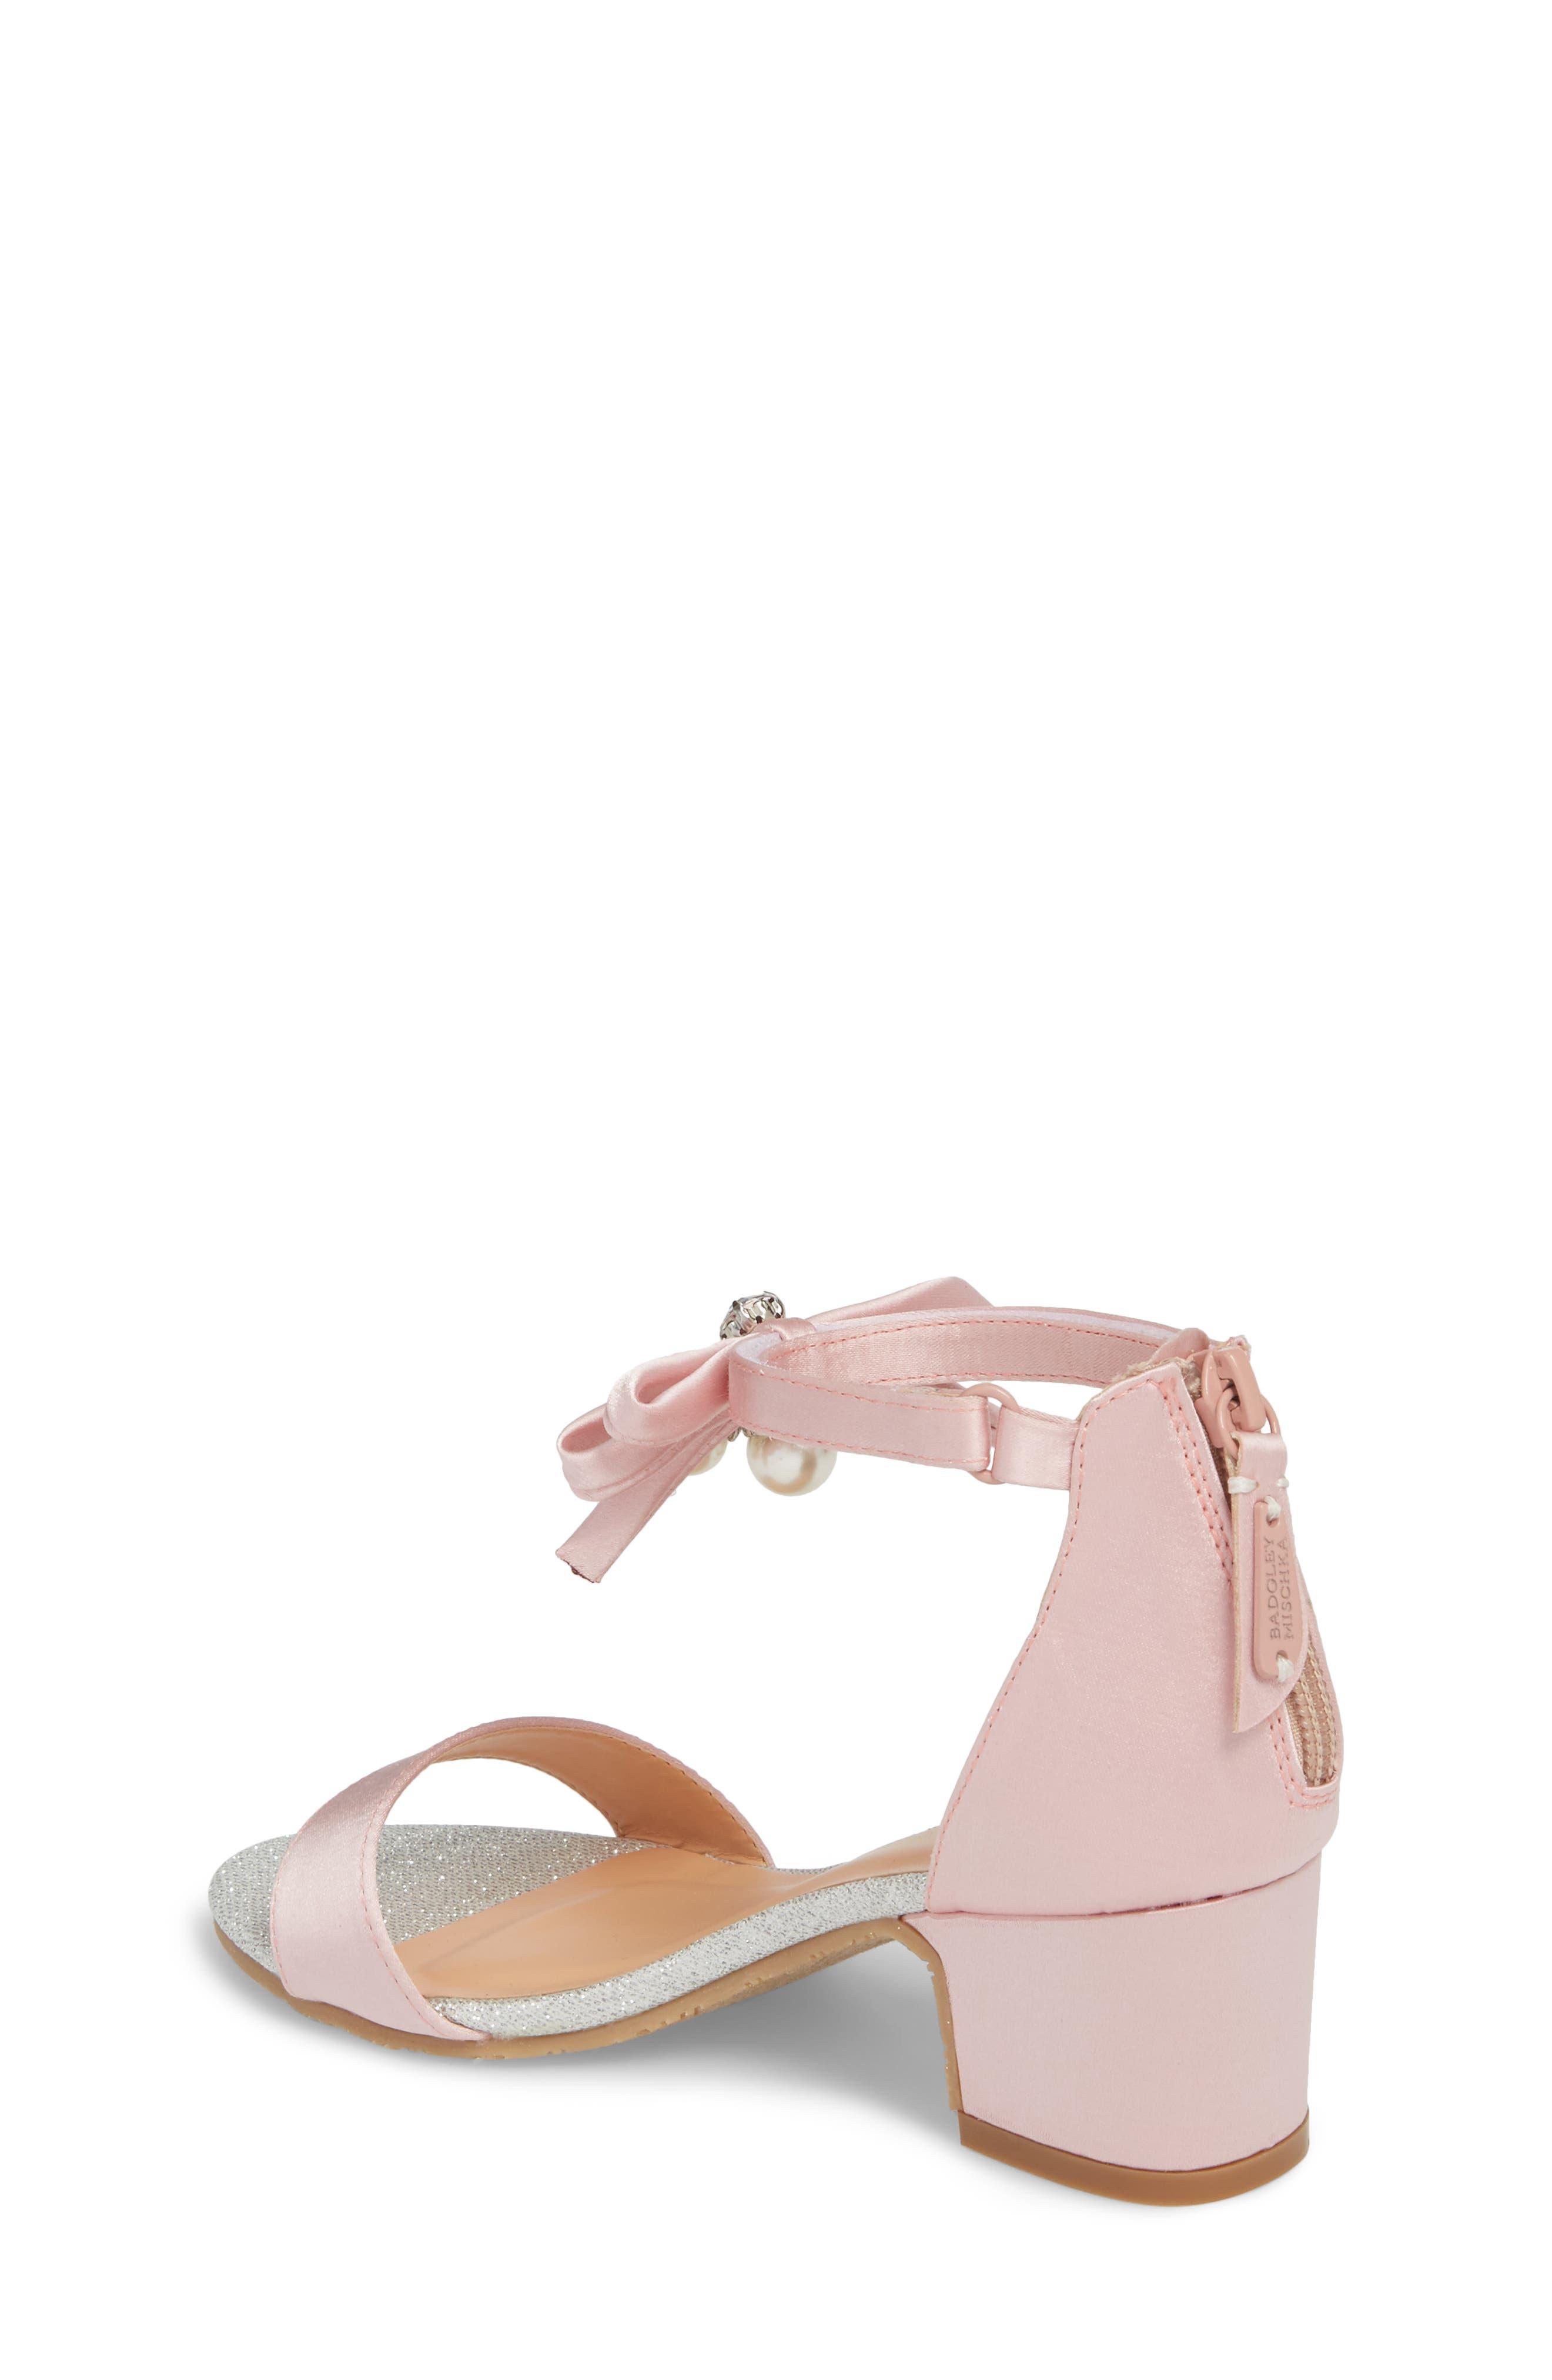 BADGLEY MISCHKA COLLECTION, Badgley Mischka Pernia Embellished Sandal, Alternate thumbnail 2, color, PINK/ SILVER